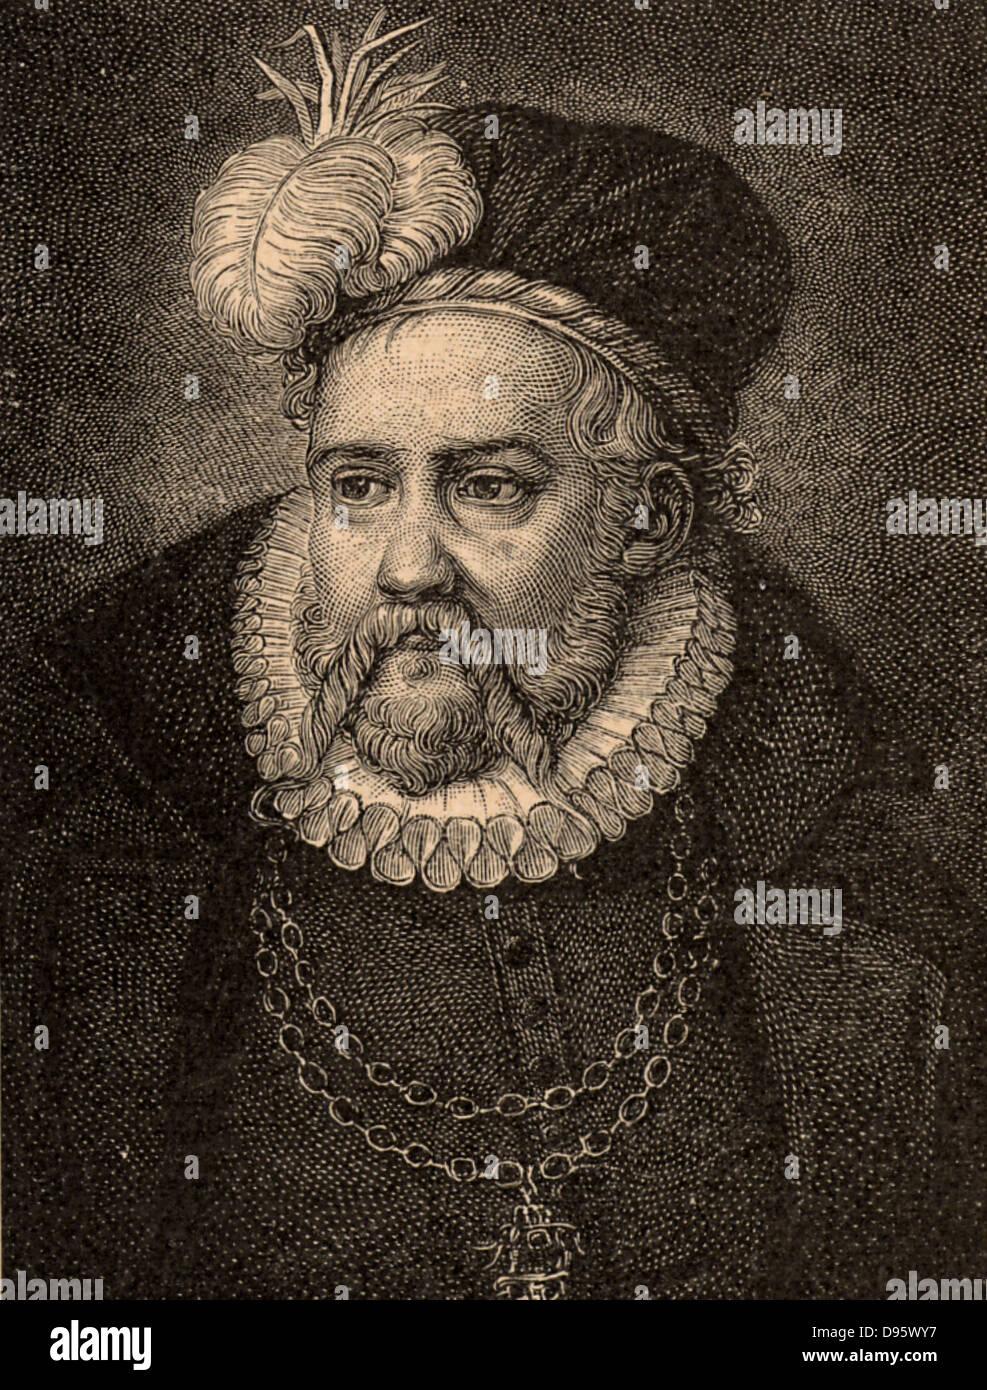 Tycho Brahe (Tyge Ottesen Brahe - 1546-1601) Danish astronomer, astrologer and alchemist who built astronomical - Stock Image